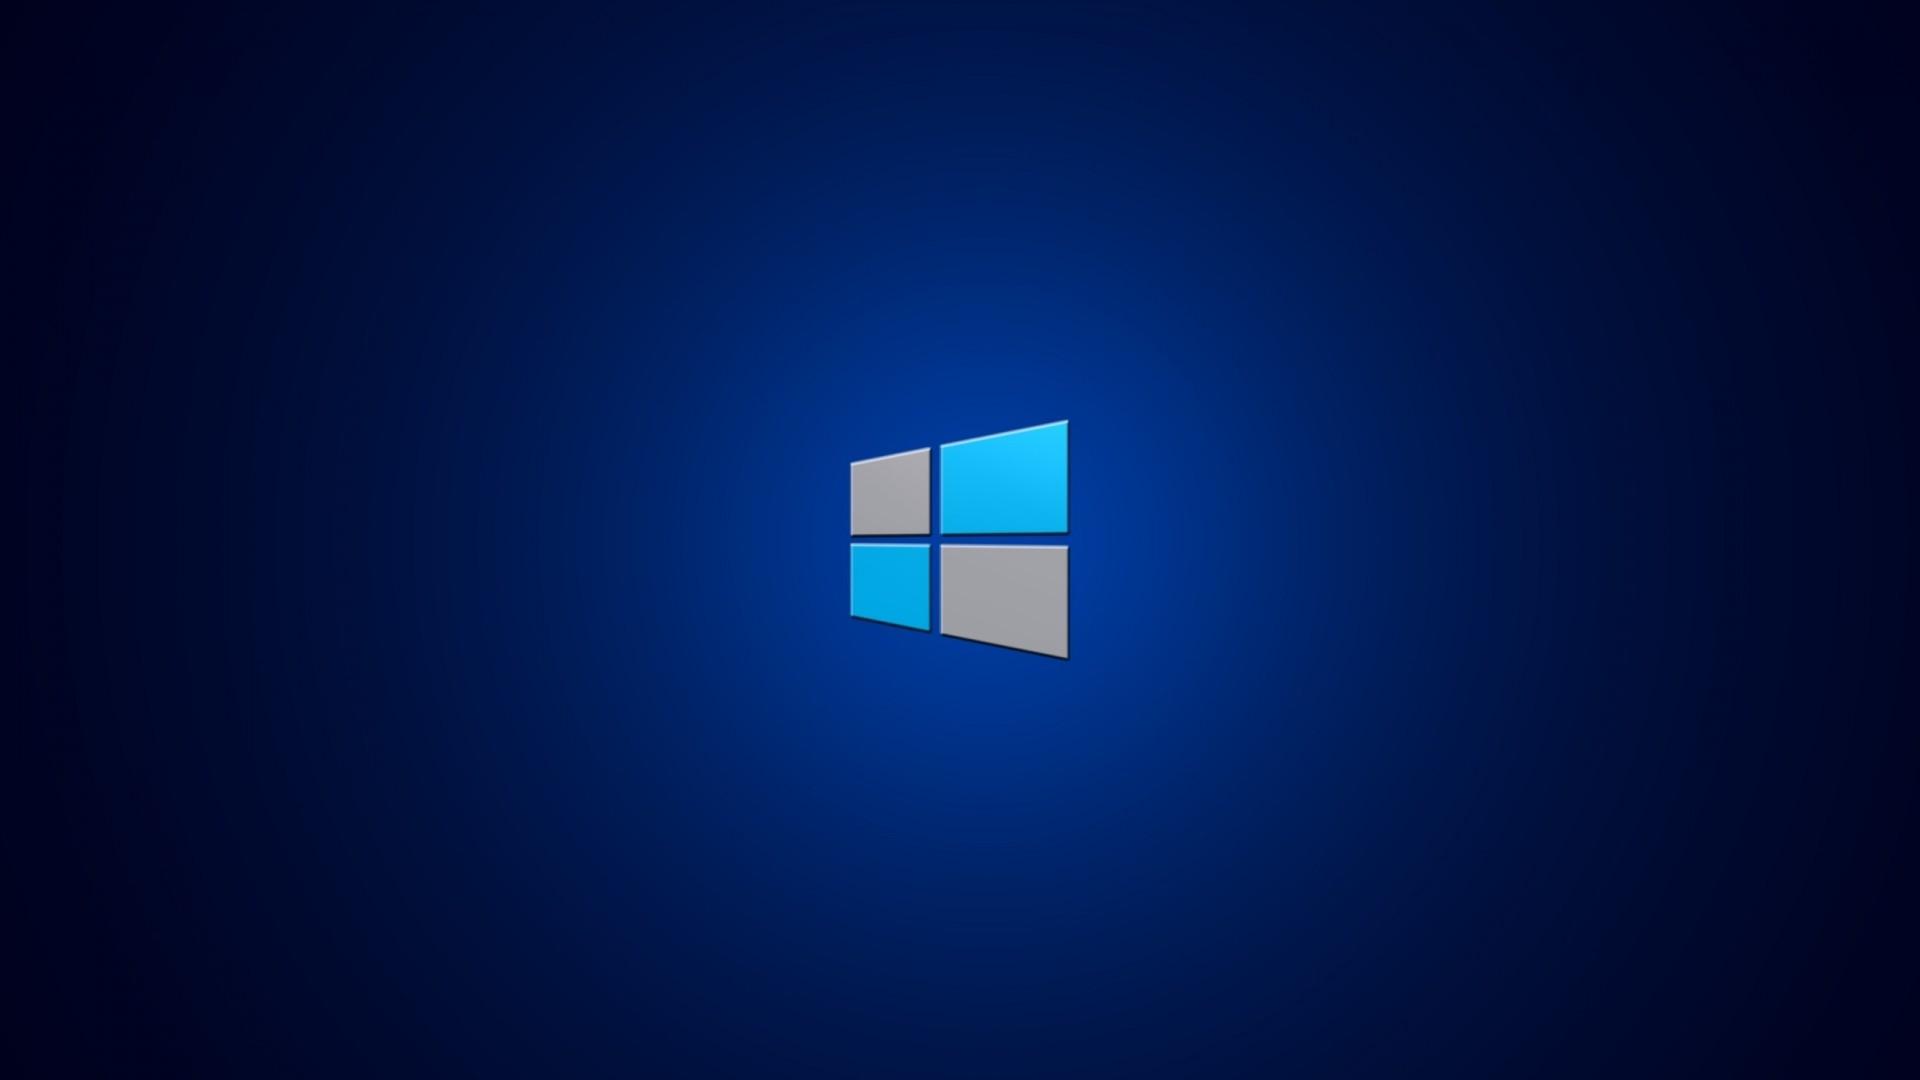 Cool Windows Wallpaper